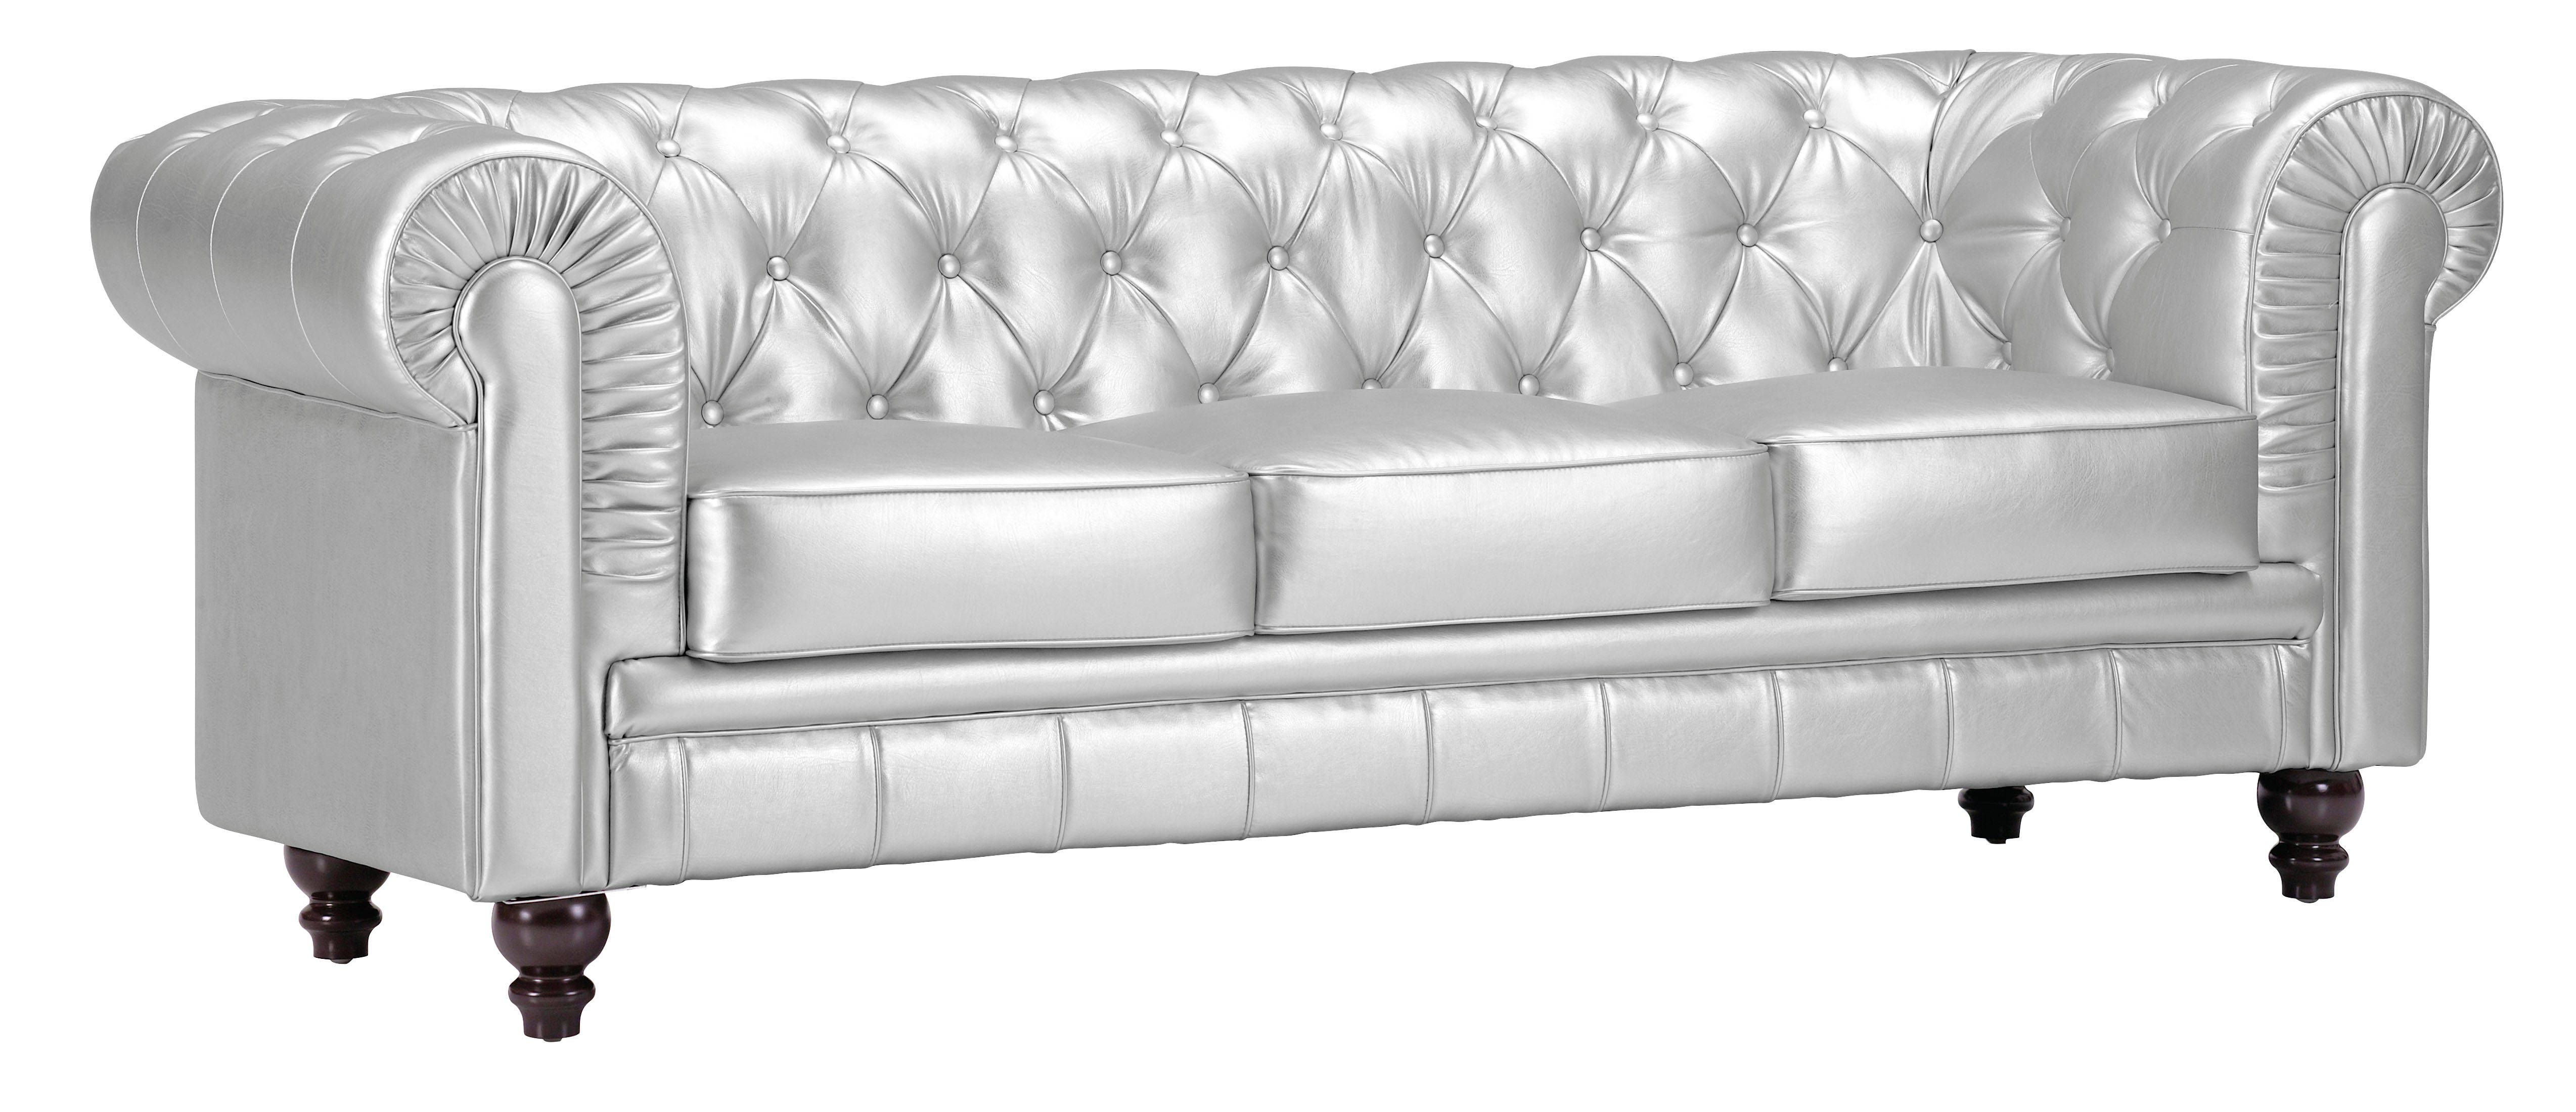 Zuo Furniture Aristocrat Silver Tufted Back Sofa